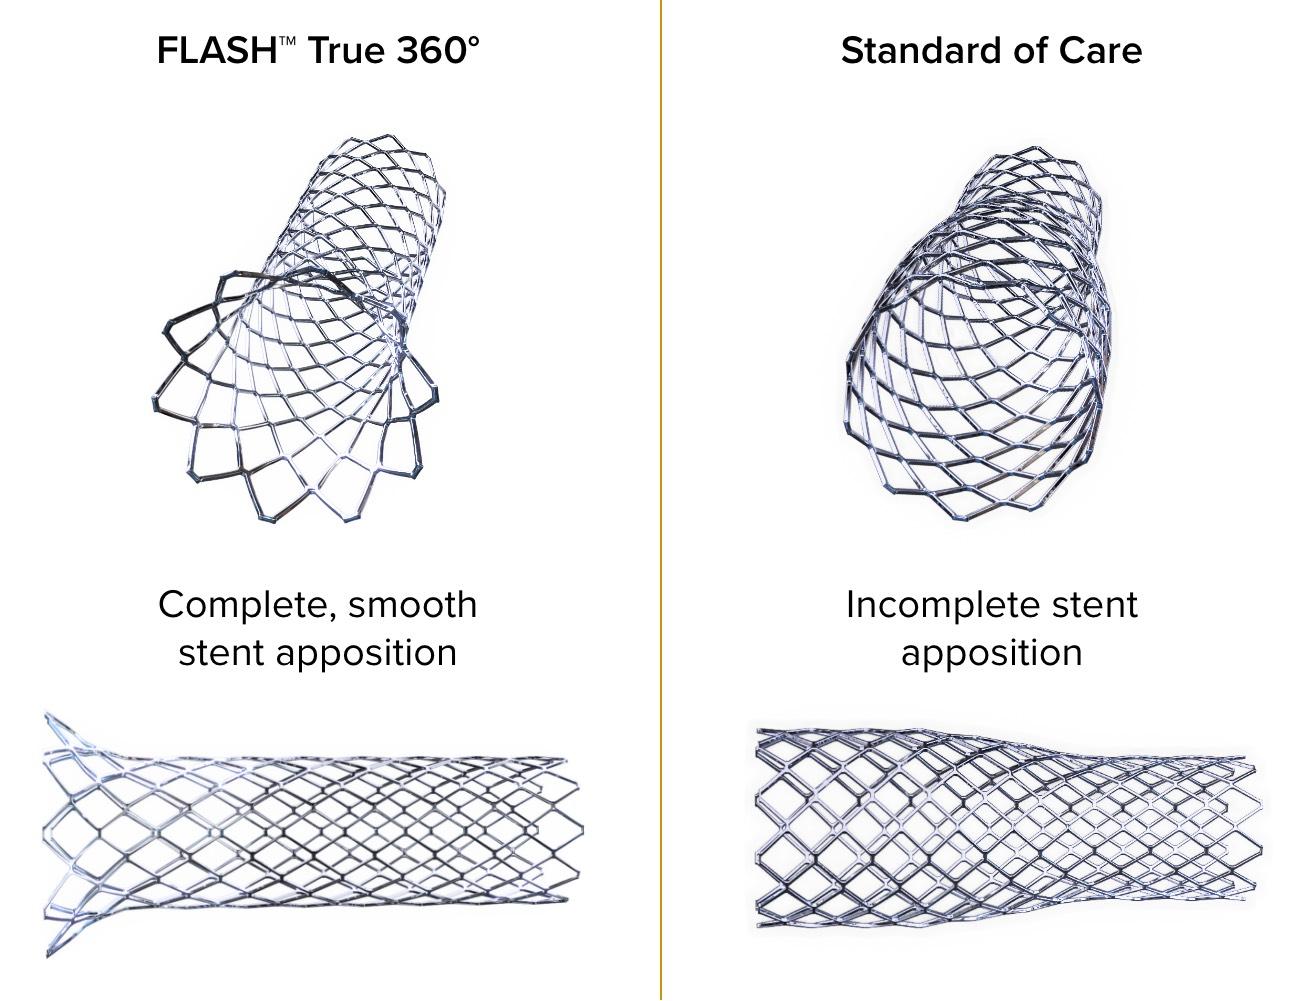 flash-vs-standard-of-care@2x